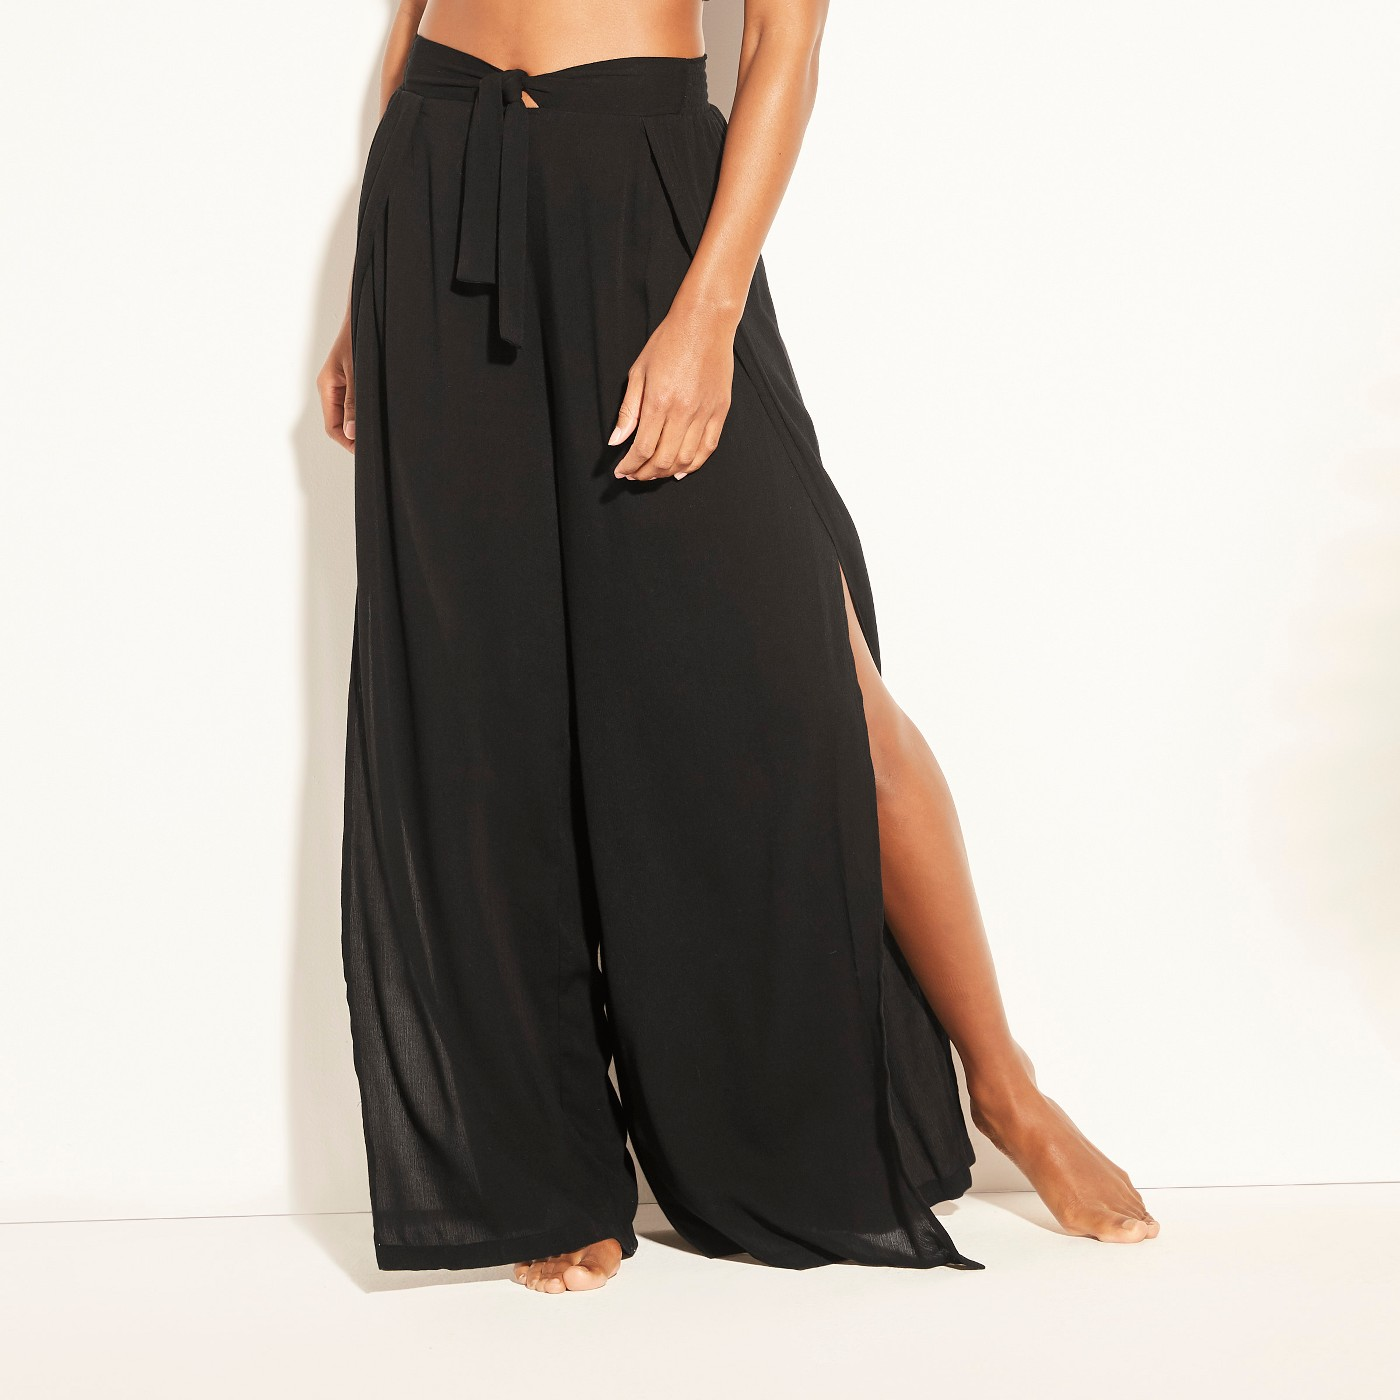 Women's Tie Waist Beach Cover Up Pants - Kona Sol™ - image 1 of 2